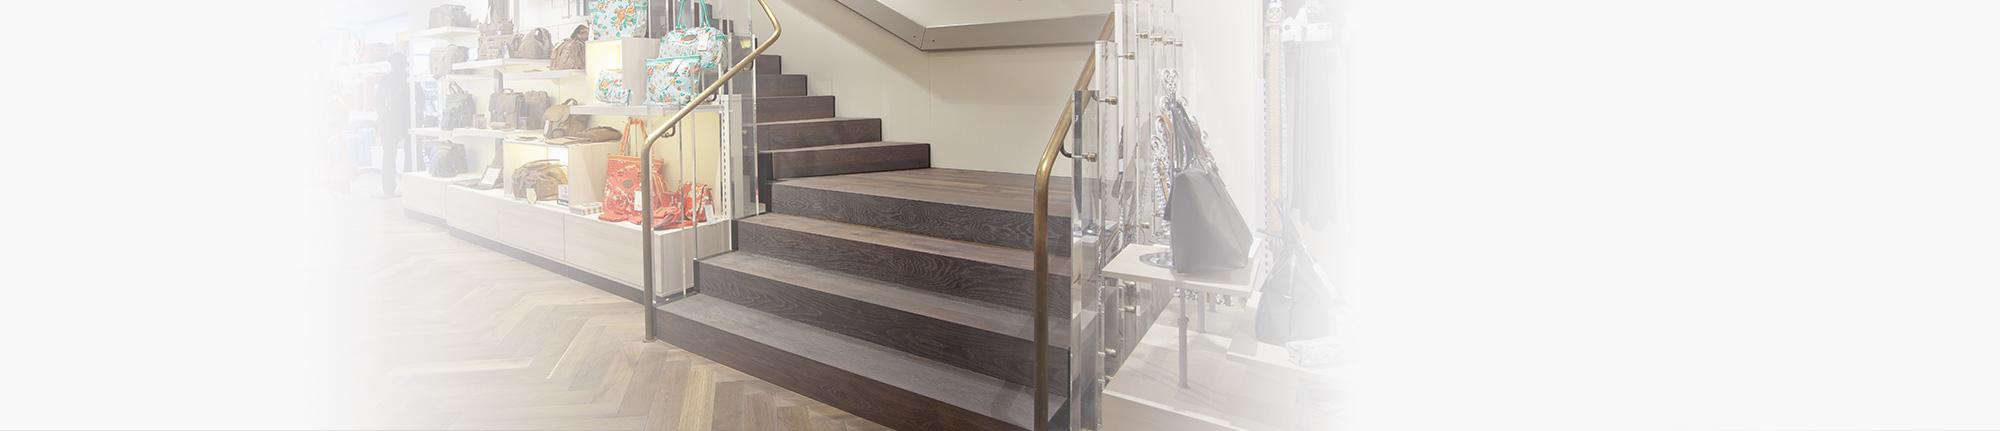 berthold bonn treppenstufen vinyl und holz gerade und gewendelt. Black Bedroom Furniture Sets. Home Design Ideas